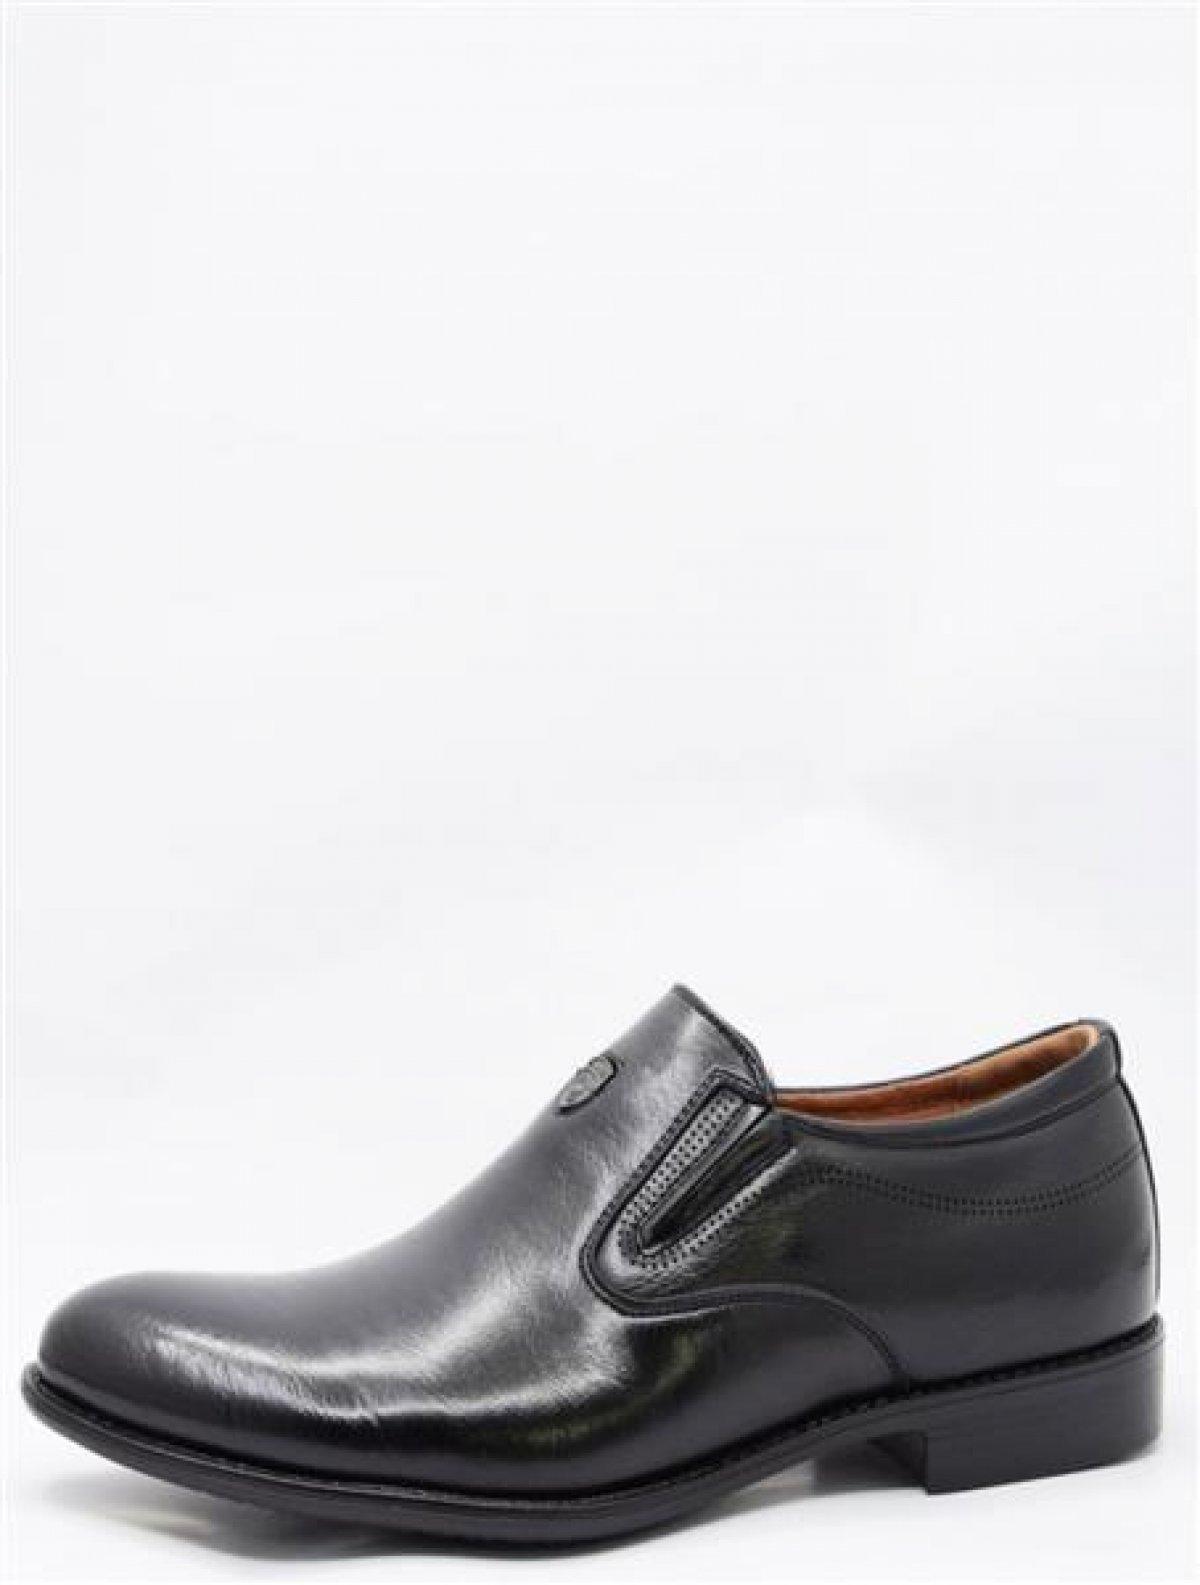 Carido SF0118-5 мужские туфли